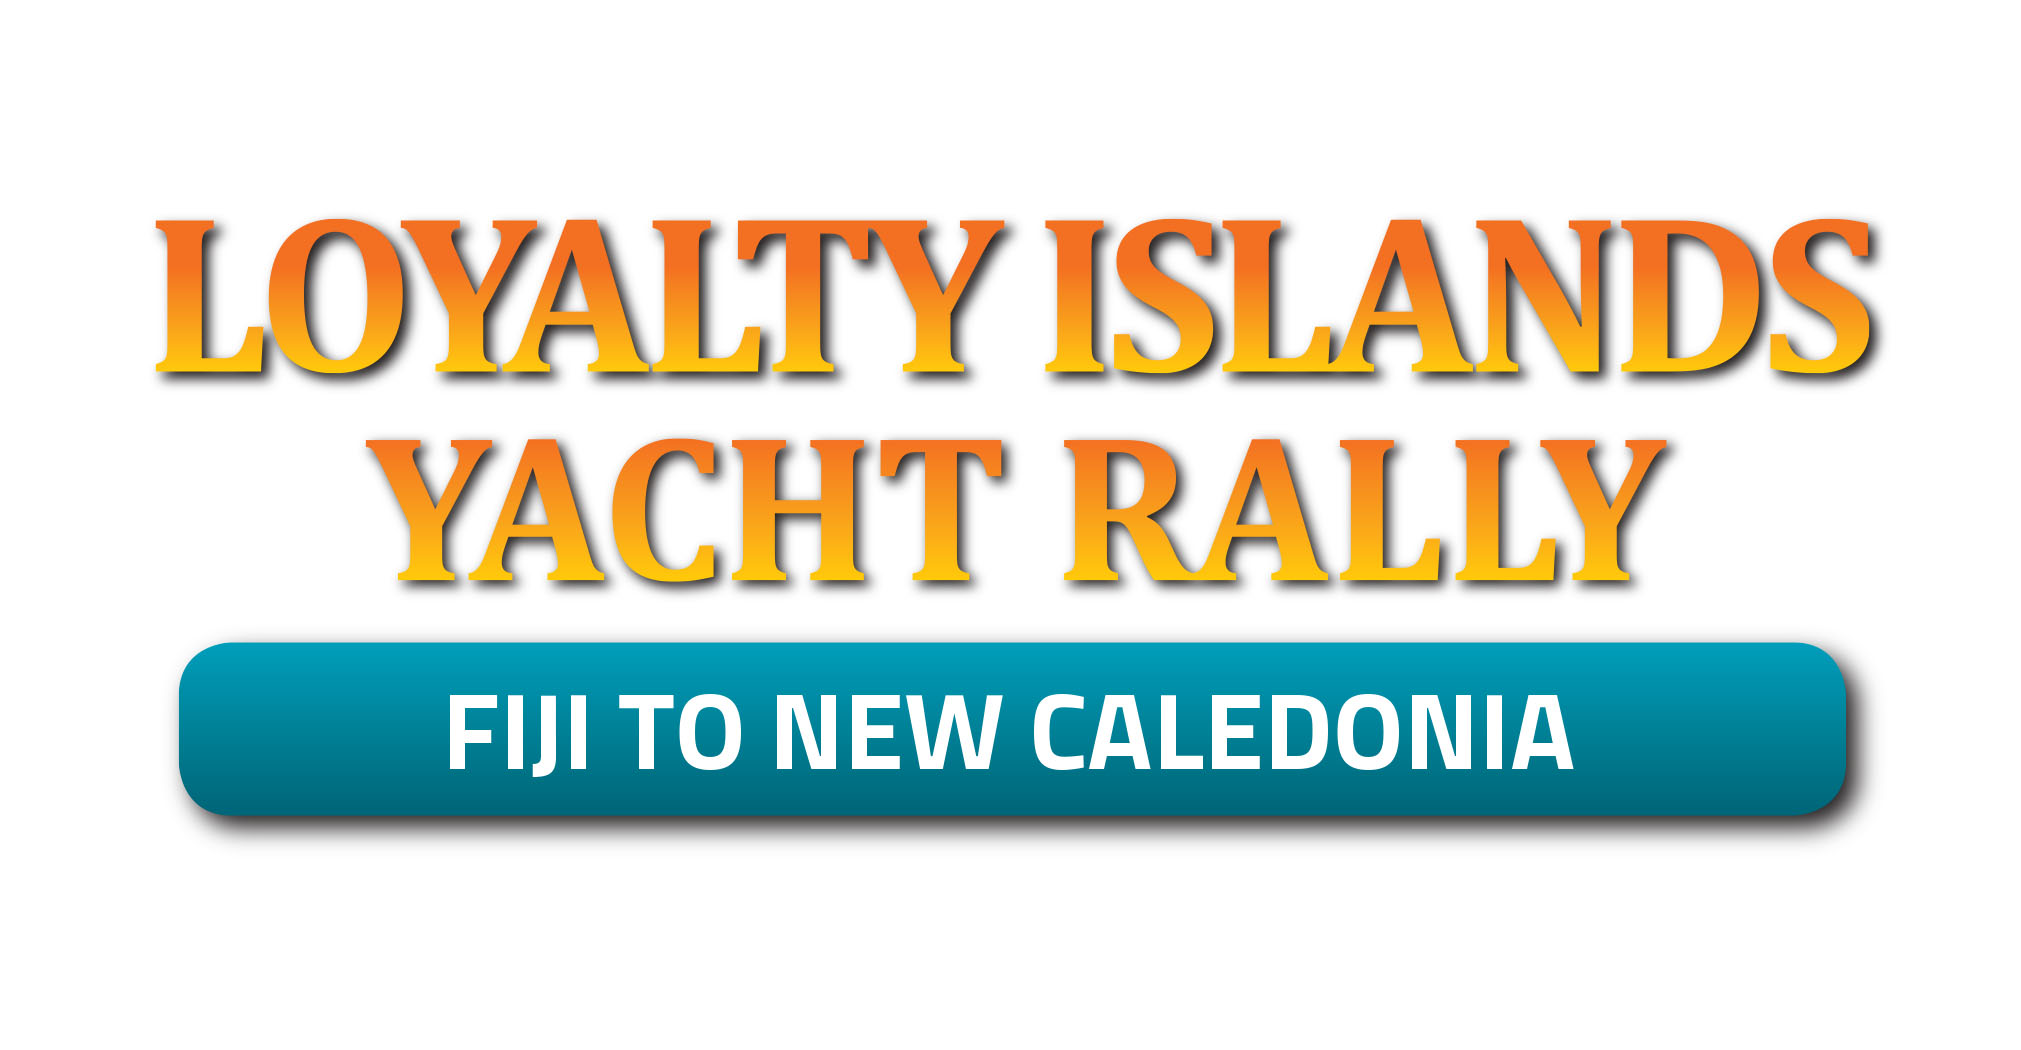 LOYALTY ISLANDS_YACHT RALLY.jpg